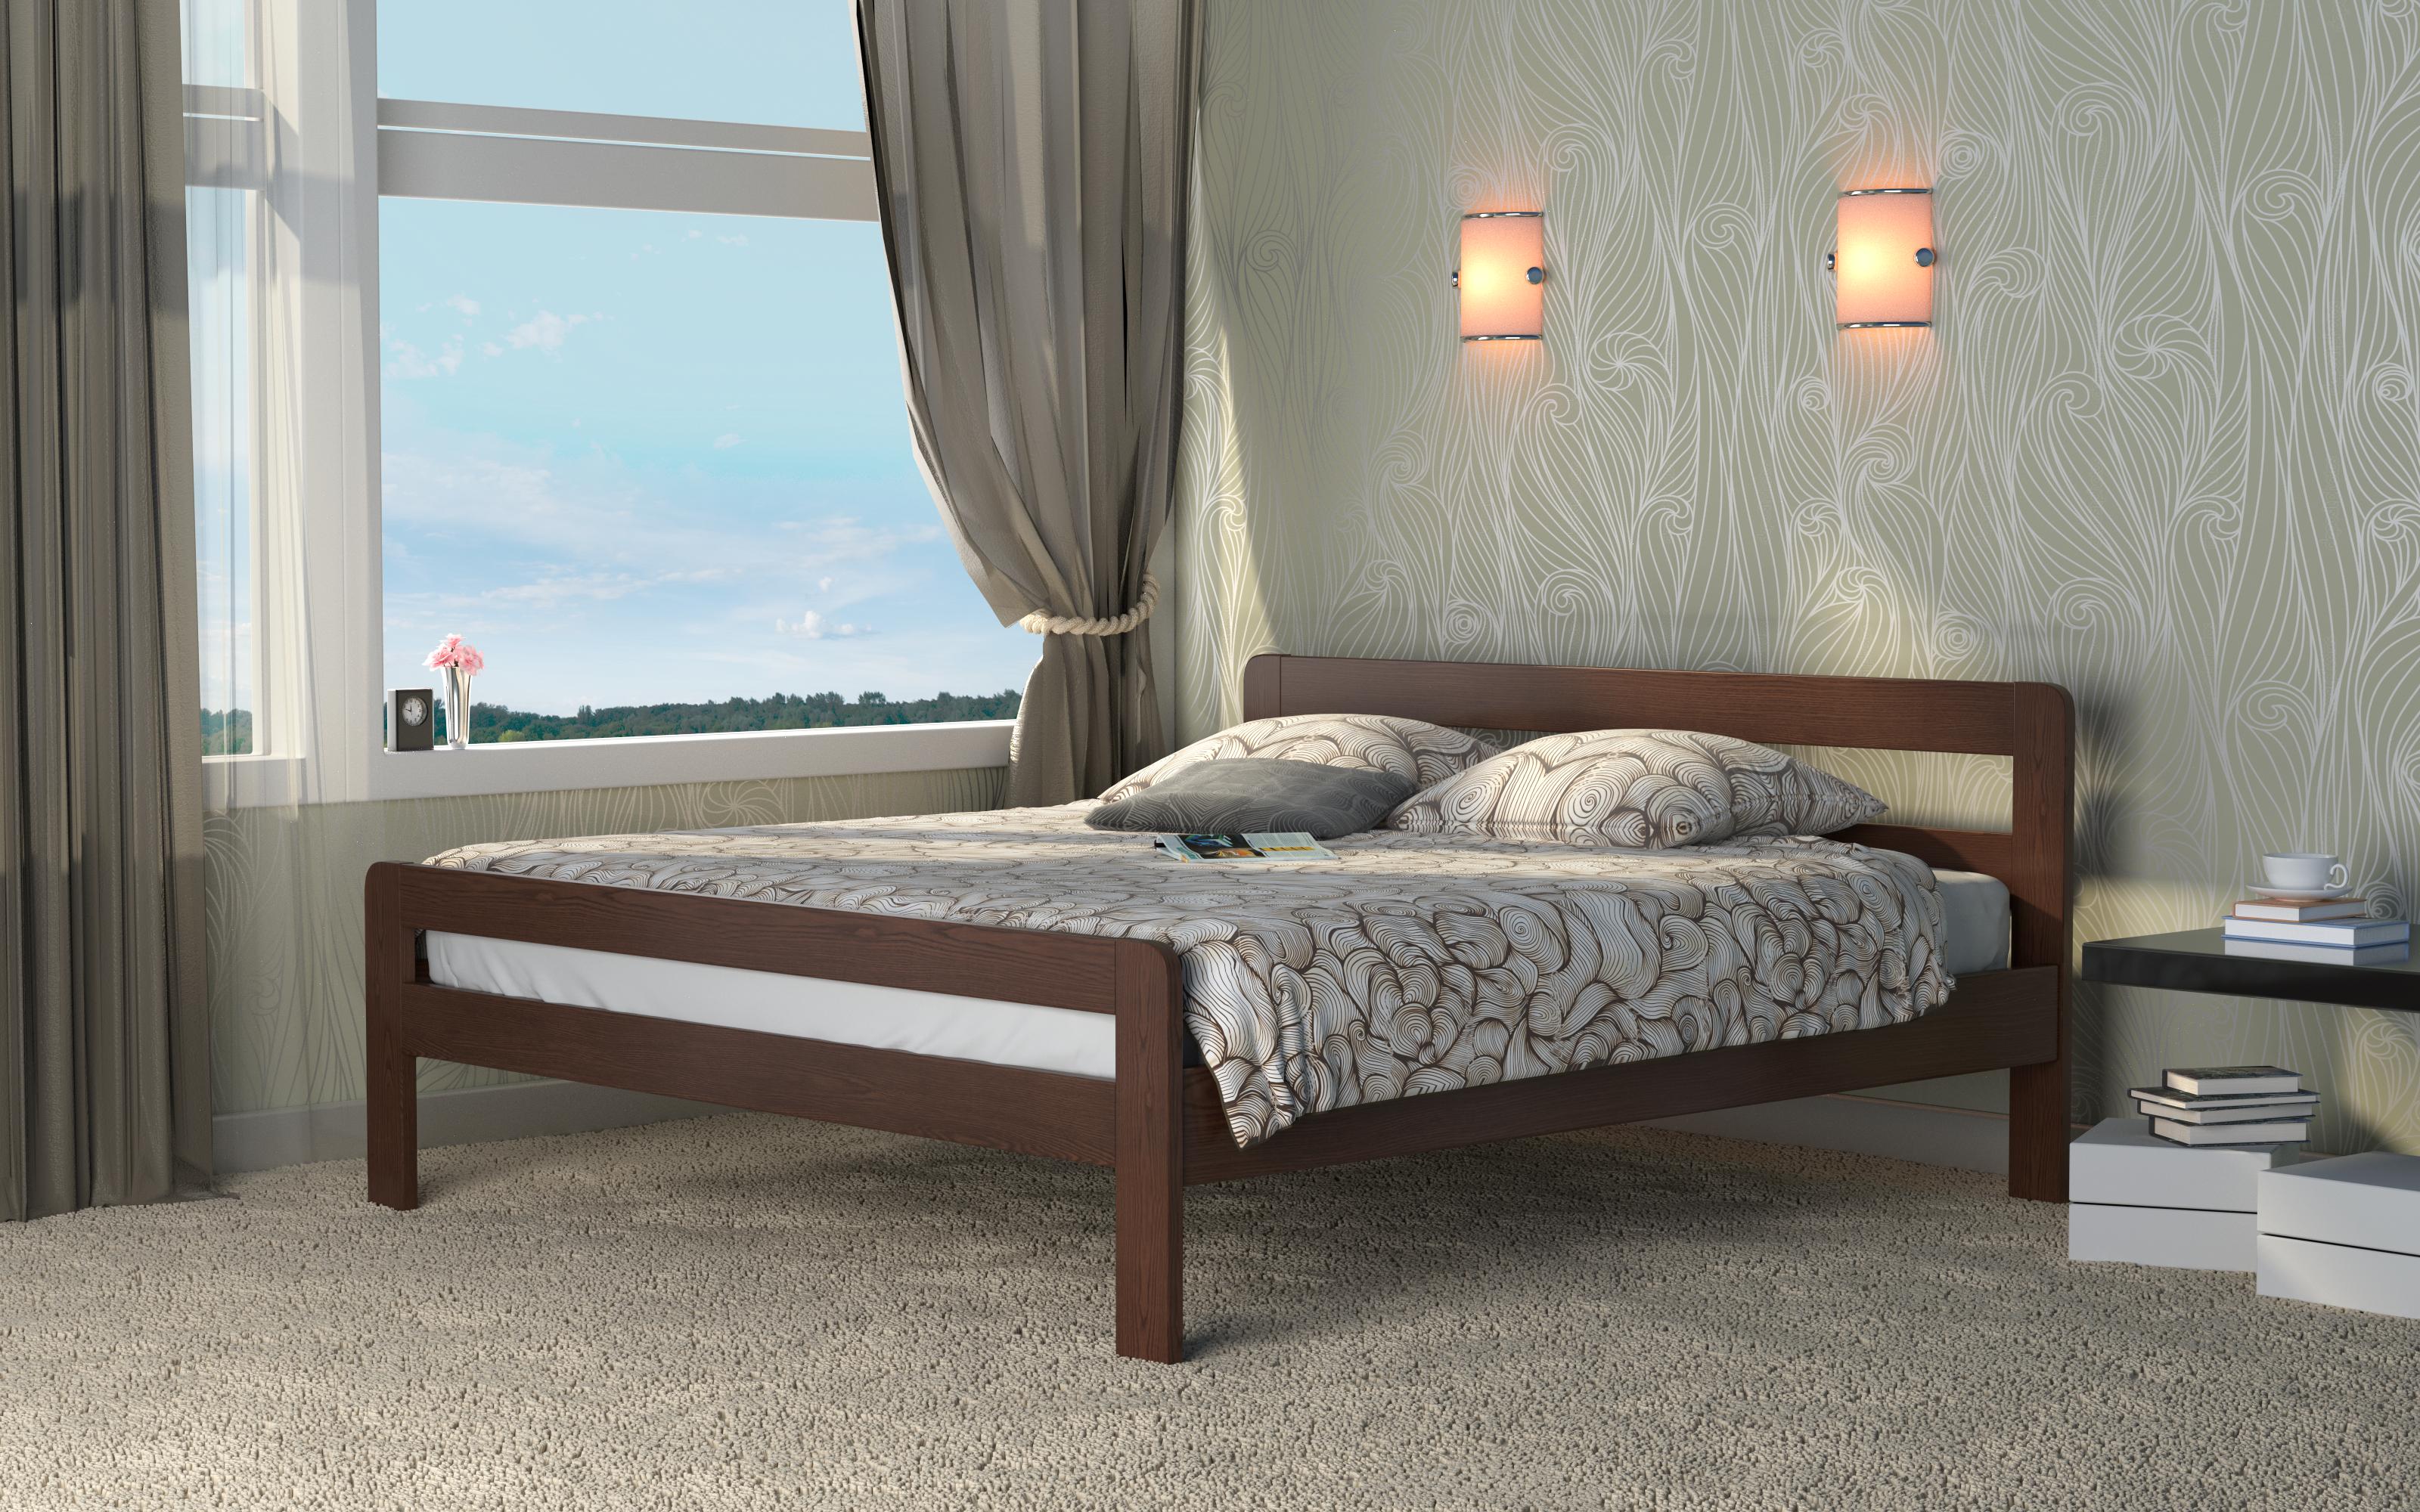 Кровать DreamLine Кредо (Ясень) Кровать Кредо (Ясень) фото